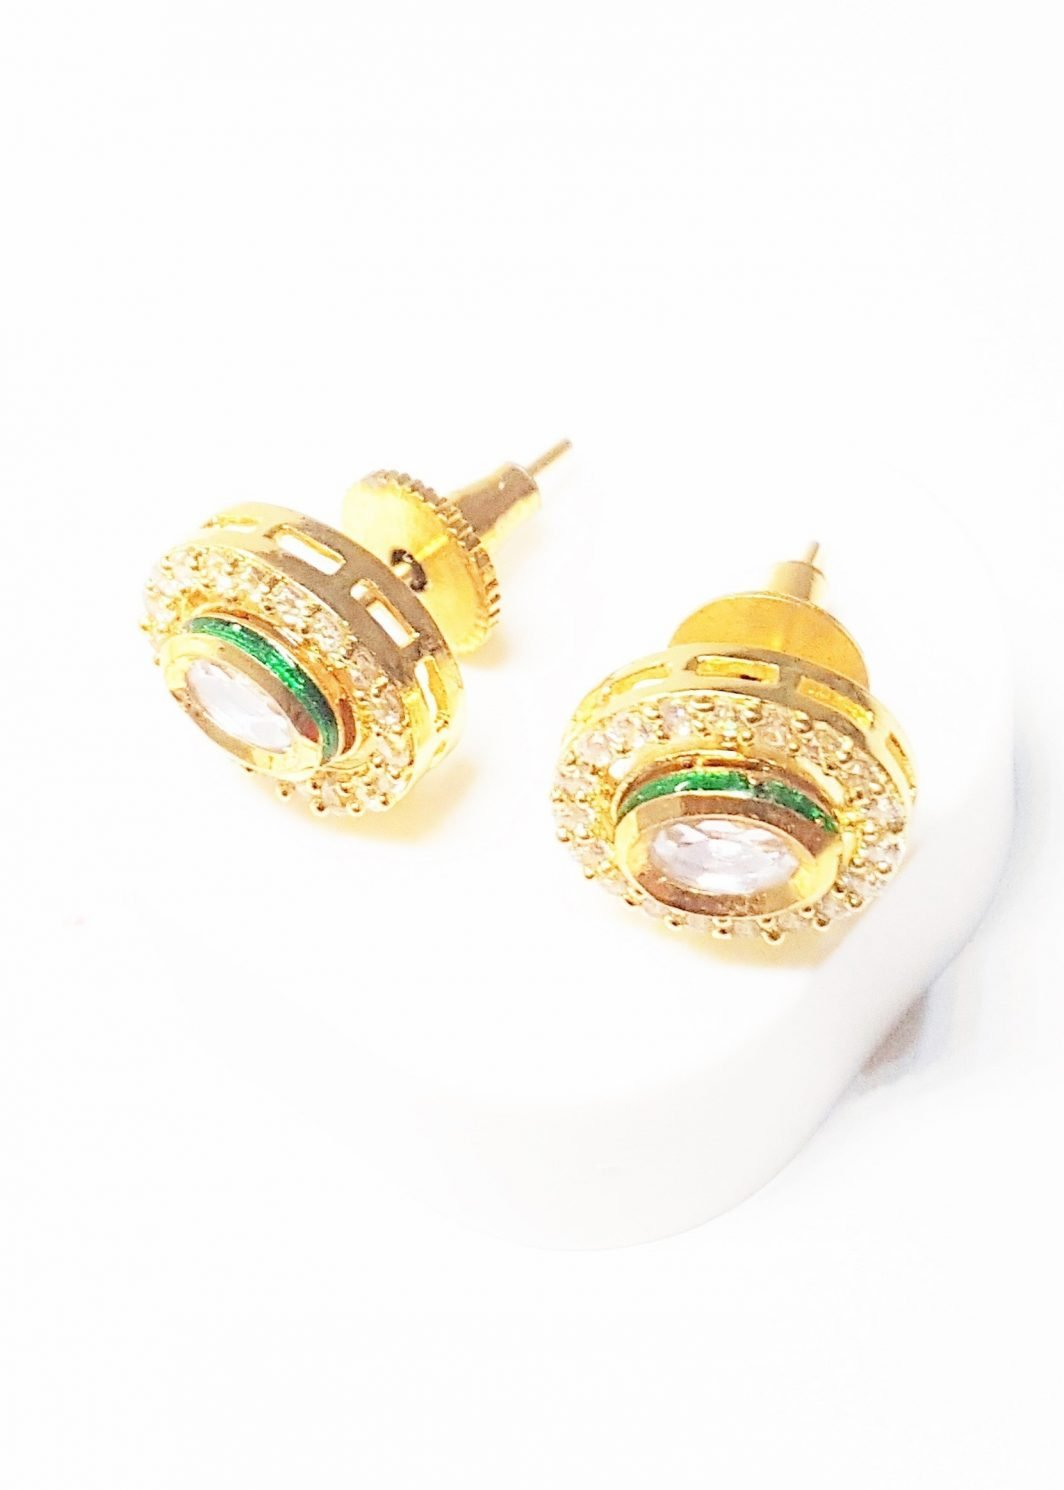 Oval Shaped White Stud Earrings